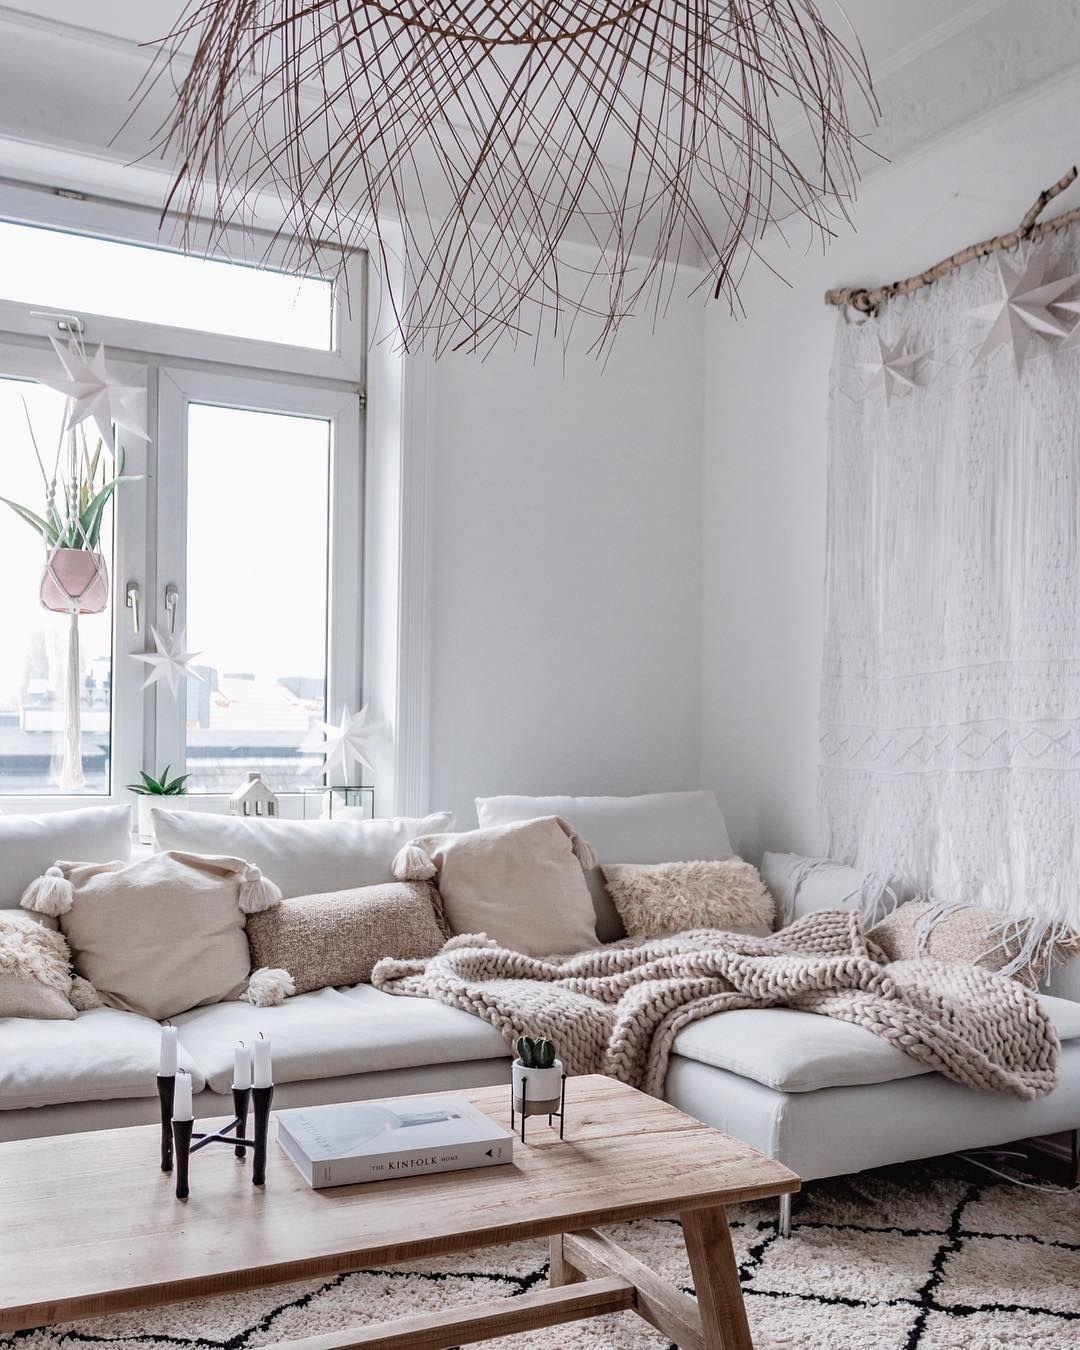 Gemutlichstes Soderhamn Sofa Von Ikea Ikea Living Room Boho Living Room Living Room Inspiration